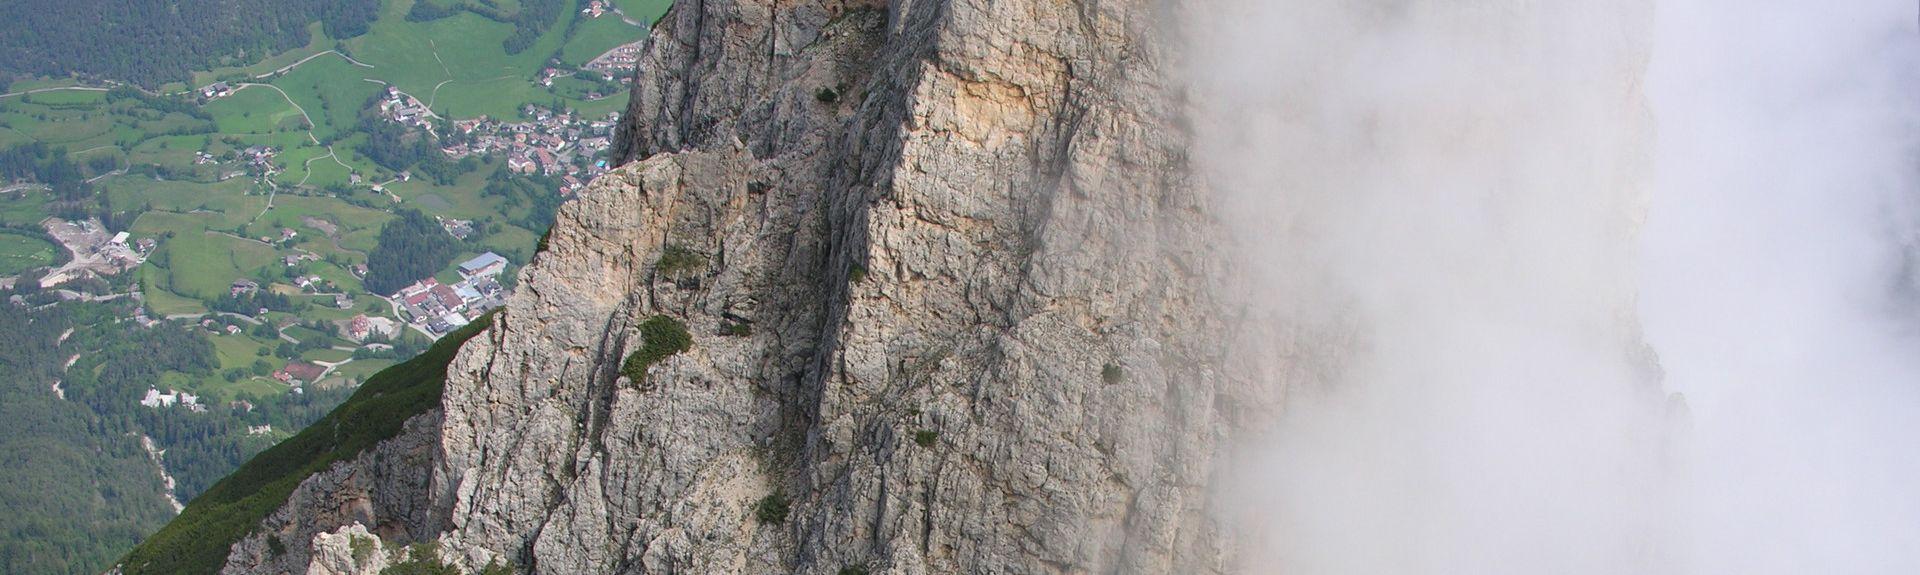 Villanders, Alto Adige, Trentino-Alto Adige/South Tyrol, Italy